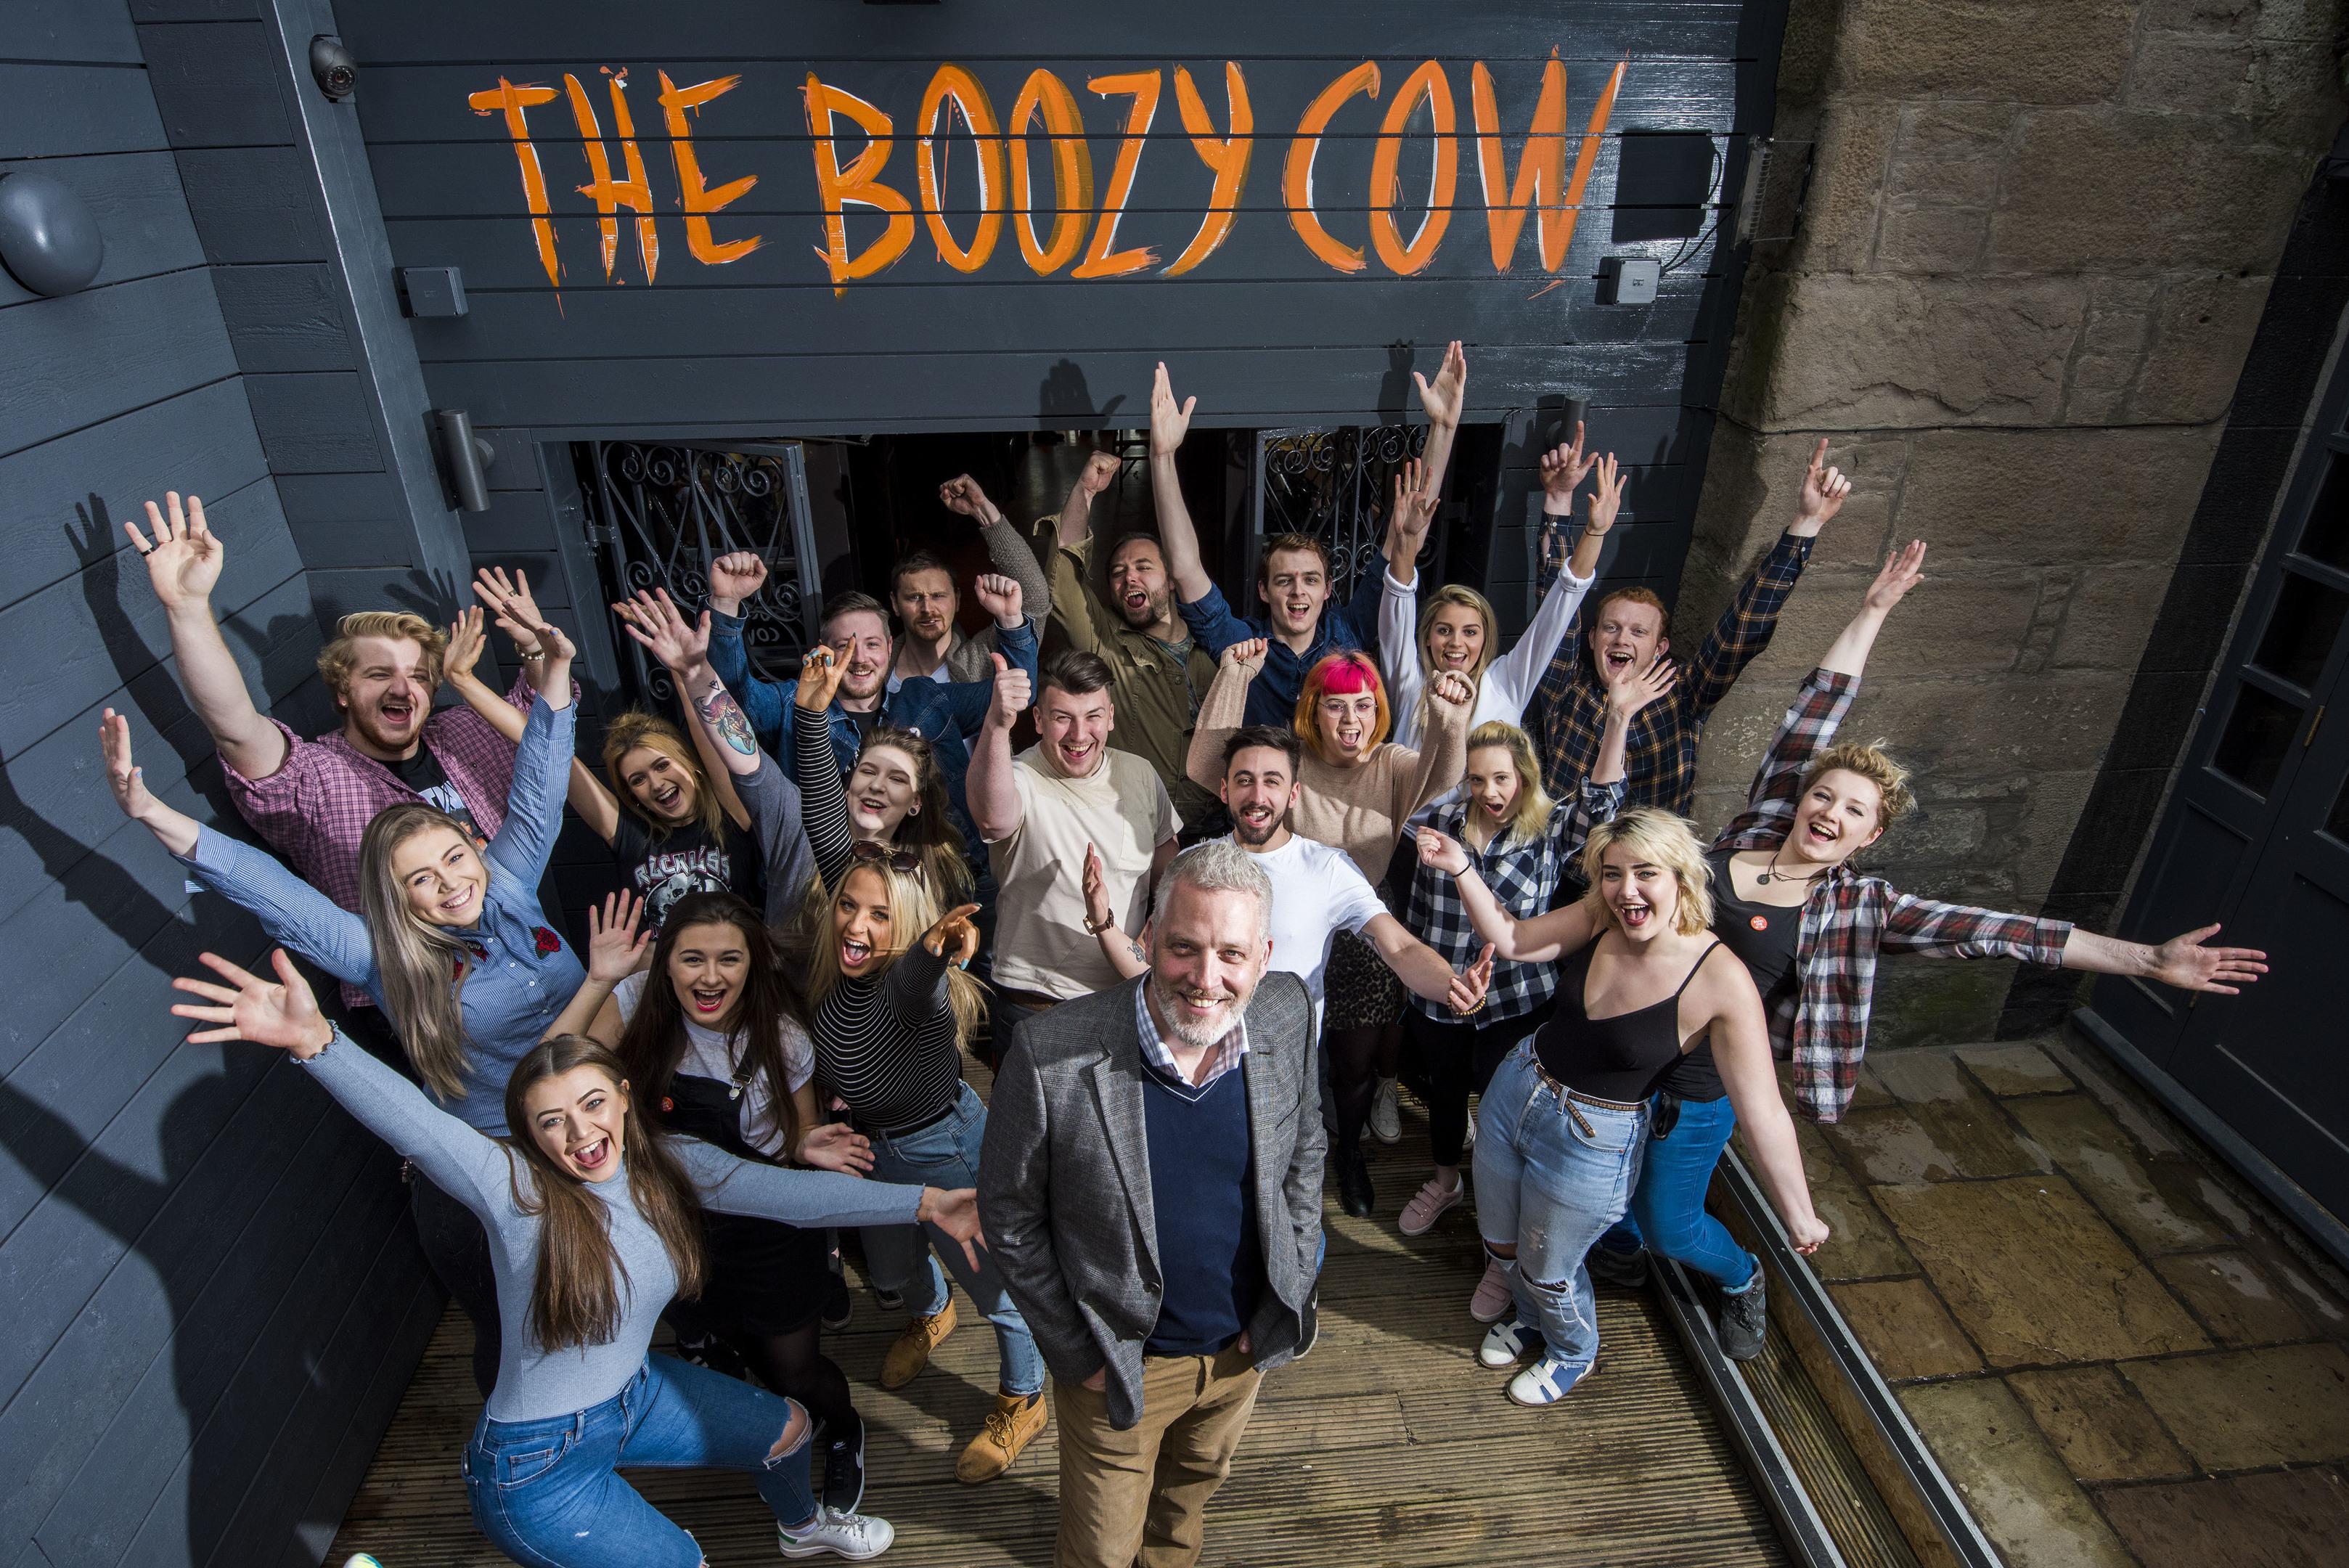 The Boozy Cow staff.